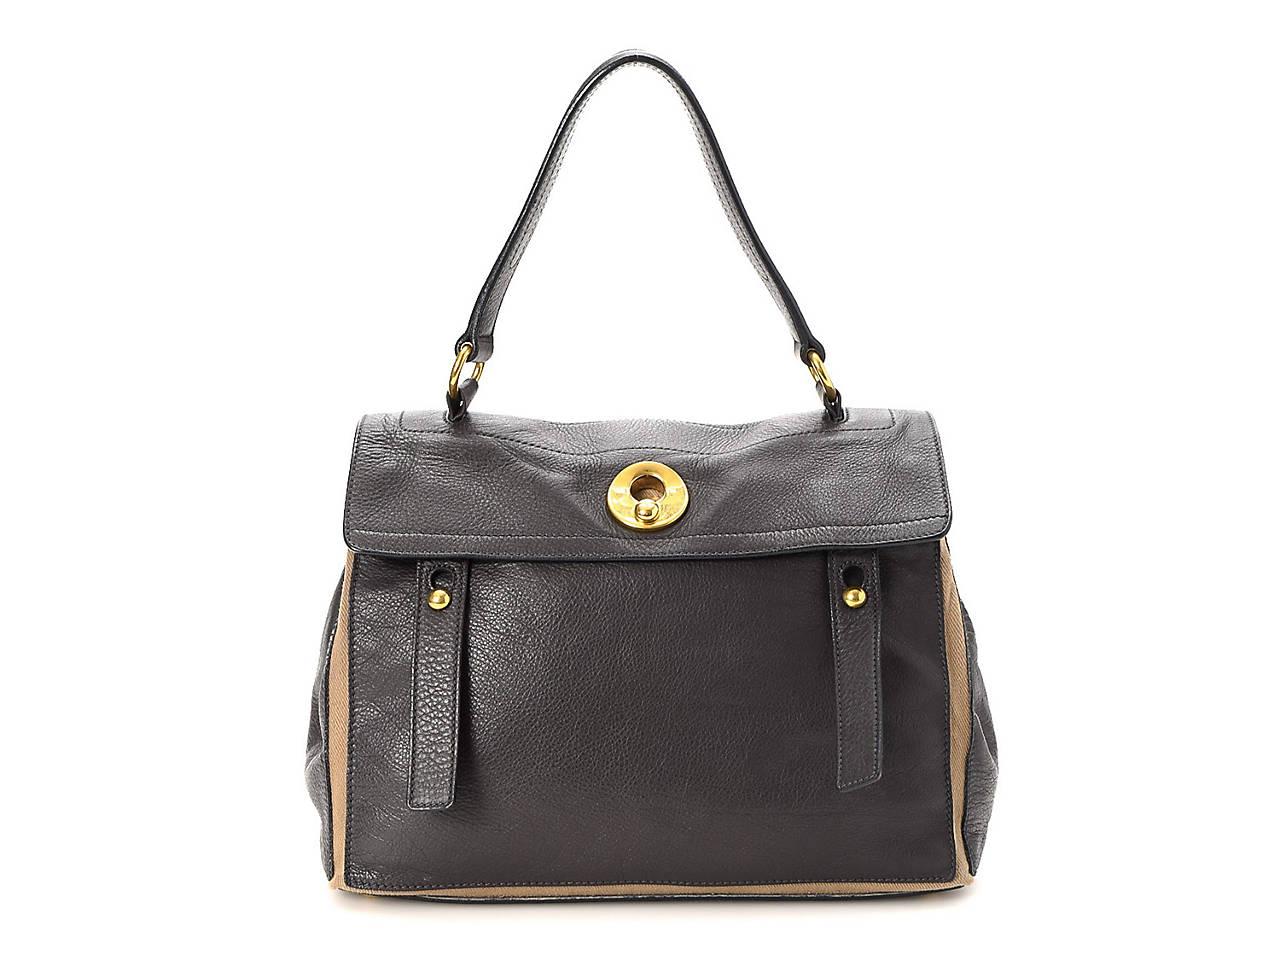 Yves Saint Laurent - Vintage Luxury Muse Two Leather Shoulder Bag ... b8285488d7c21